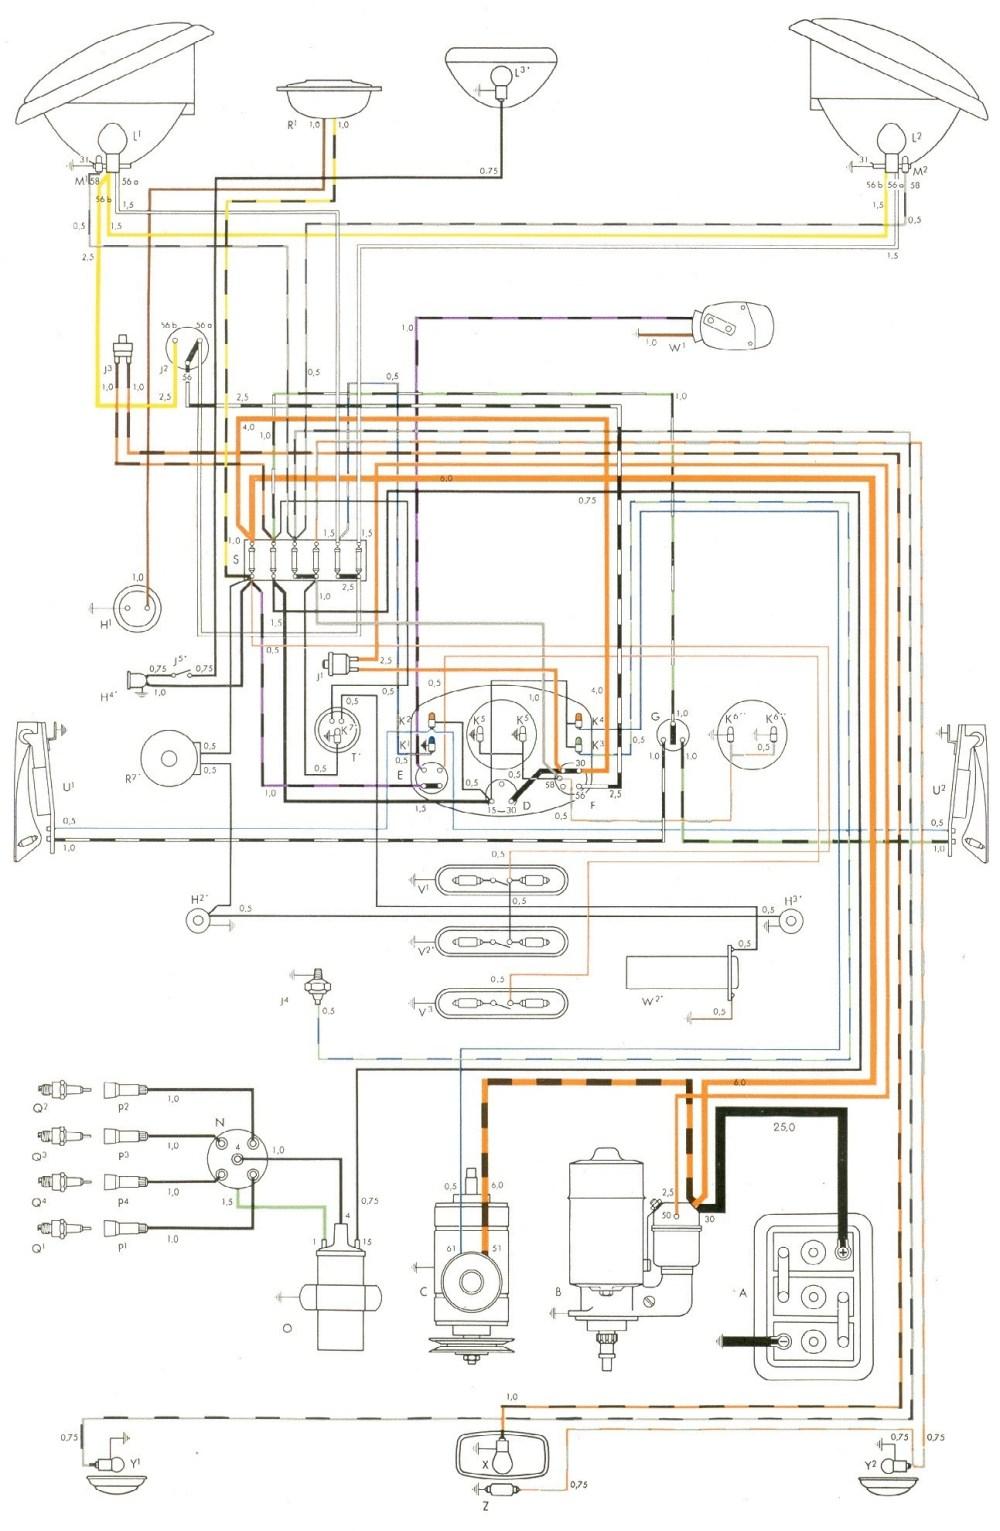 medium resolution of vw voltage regulator wiring diagram 1973 simple wiring diagrams rh 22 studio011 de 1974 vw alternator wiring diagram snowmobile voltage regulator wiring